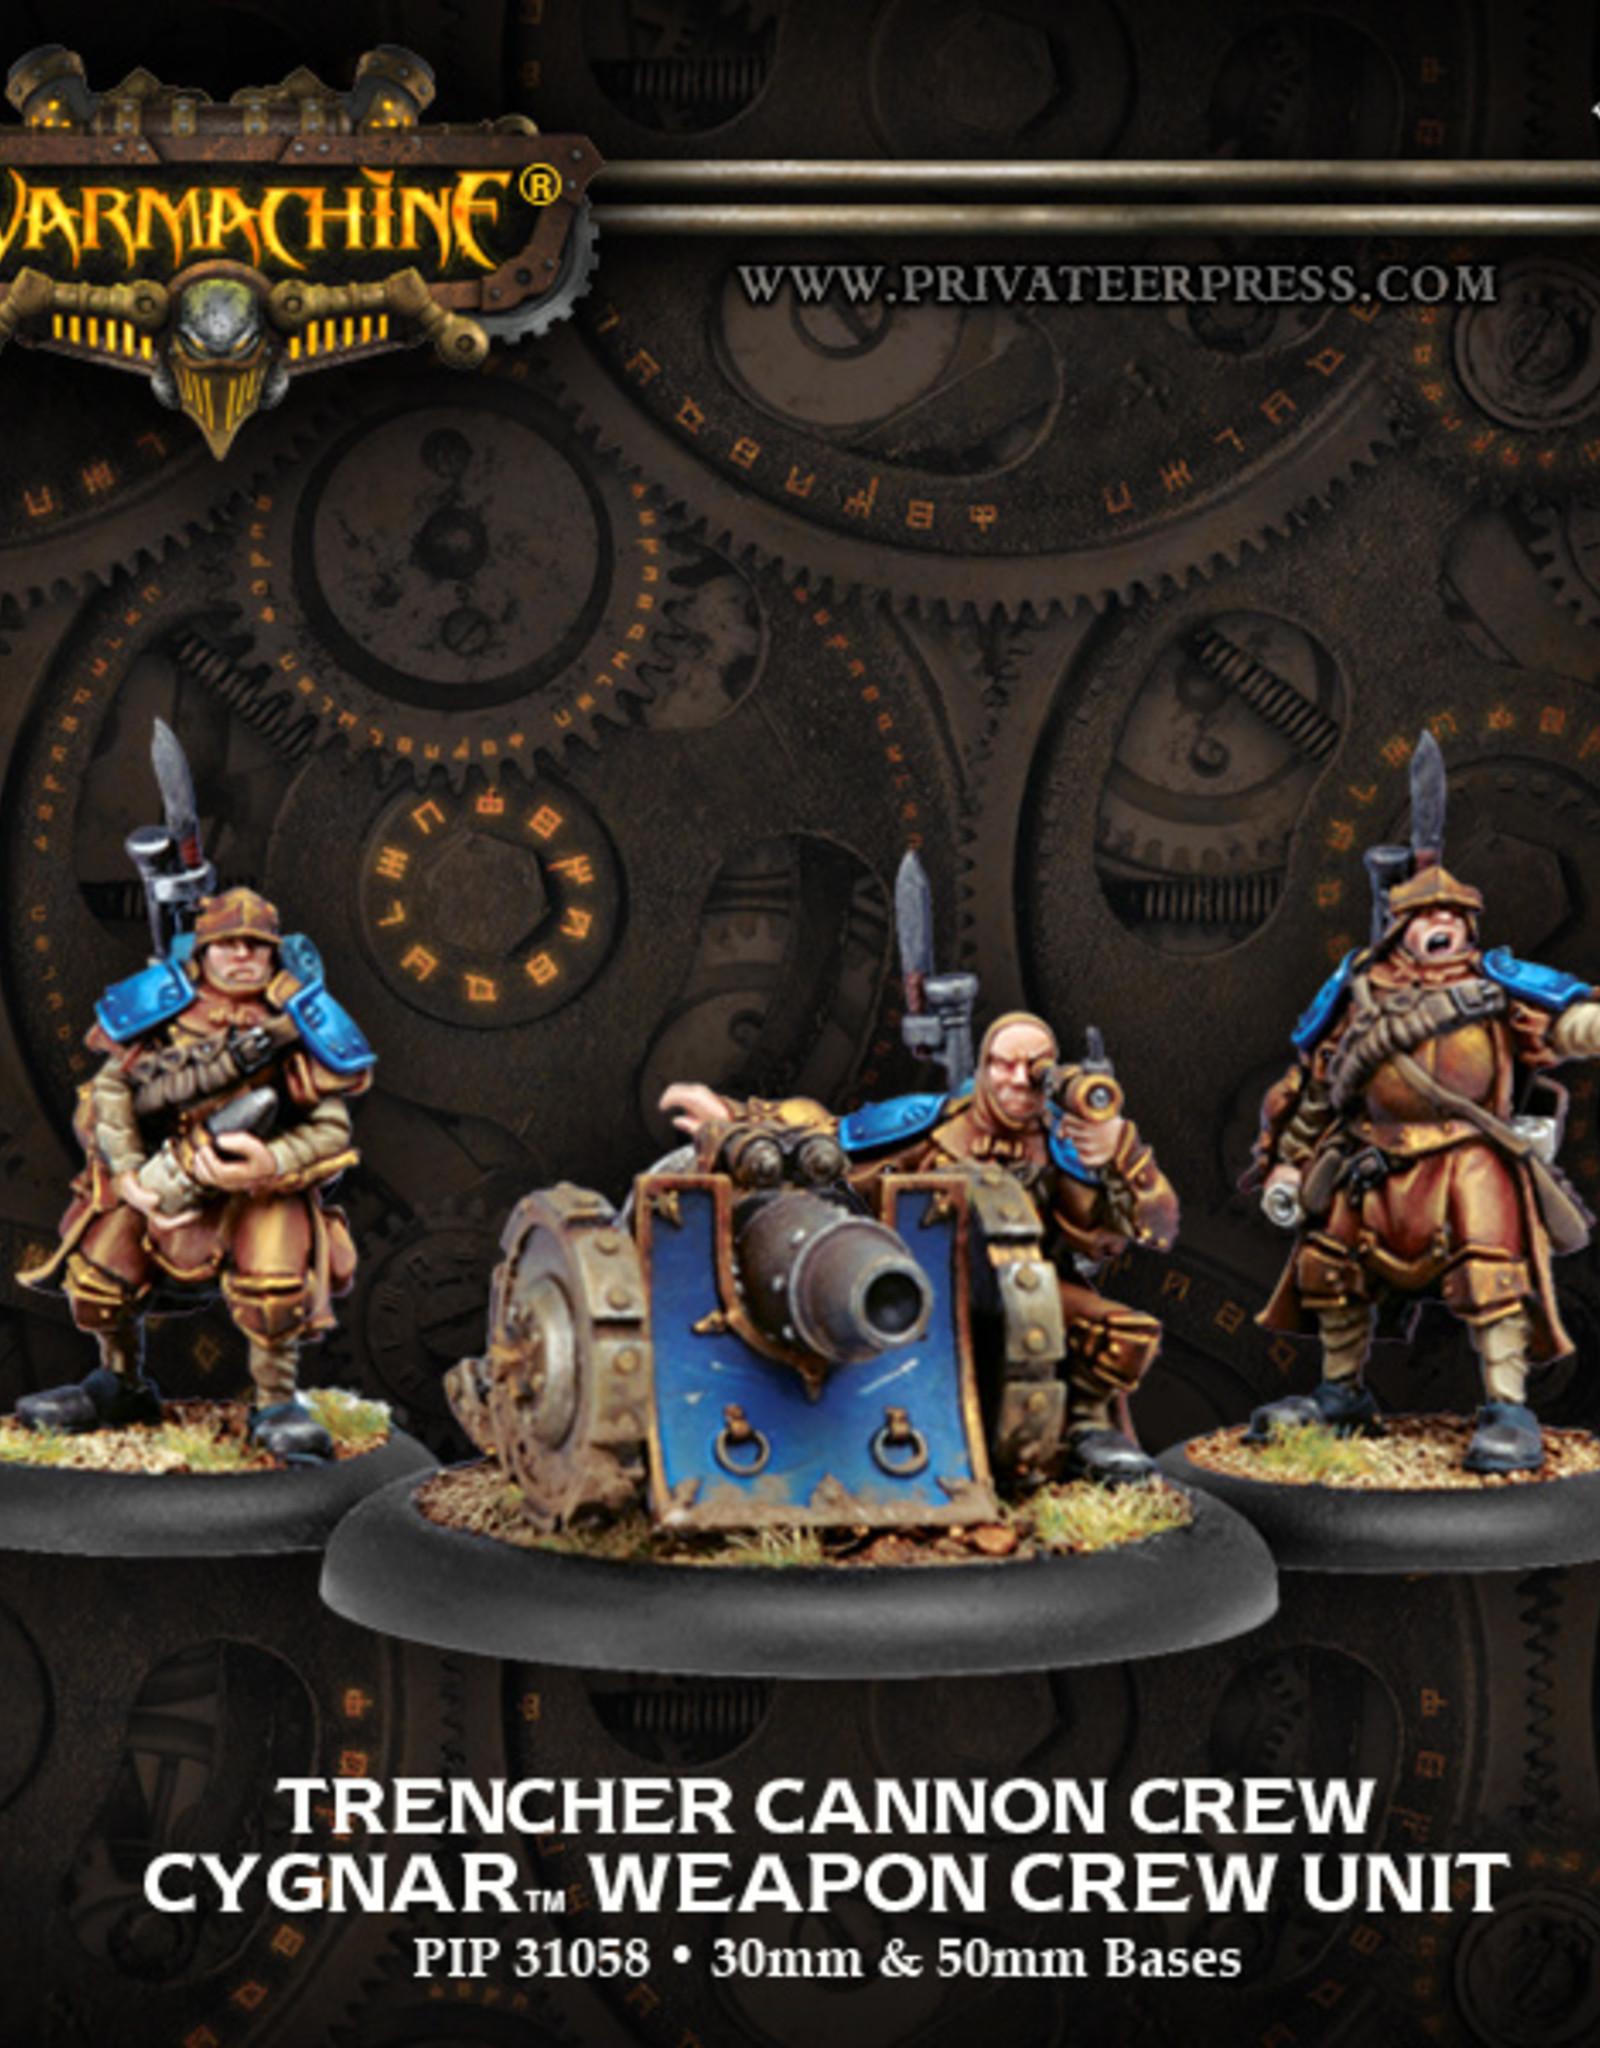 Privateer Press Trencher Cannon Crew